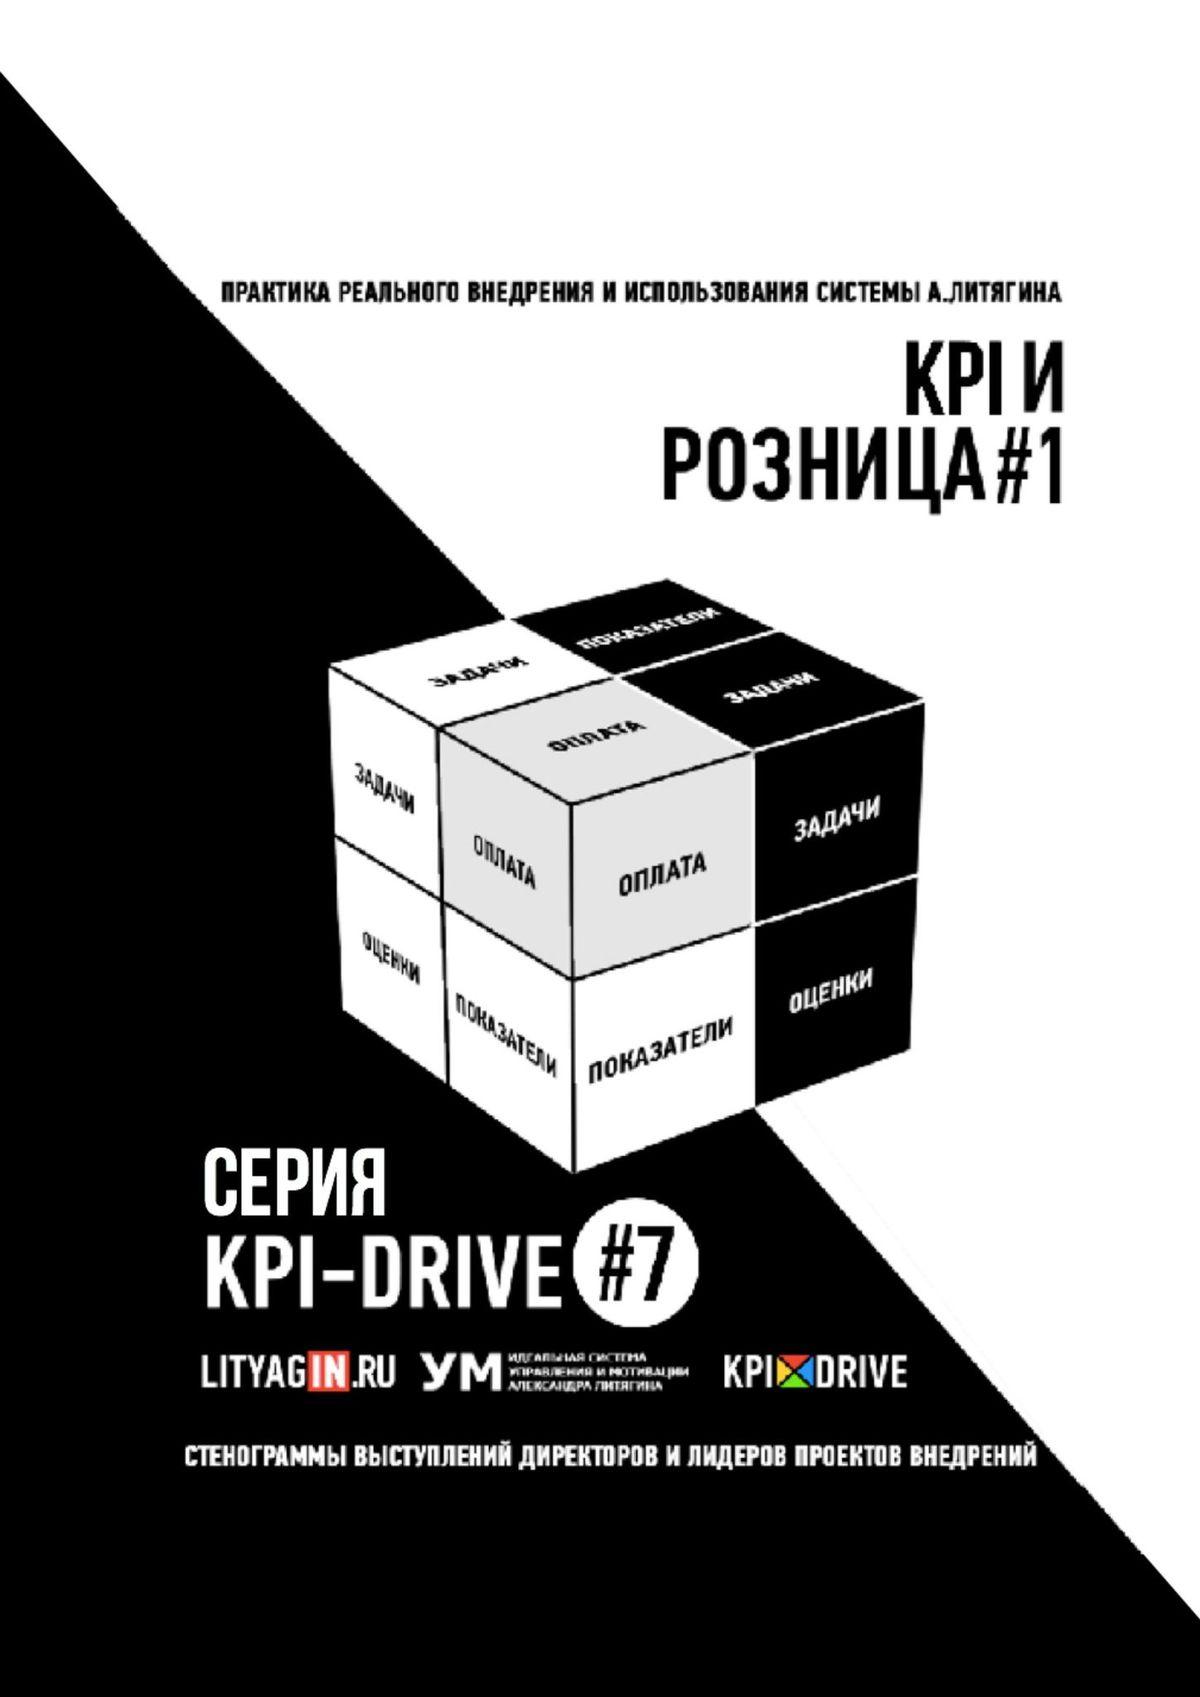 KPI-DRIVE#7. РОЗНИЦА